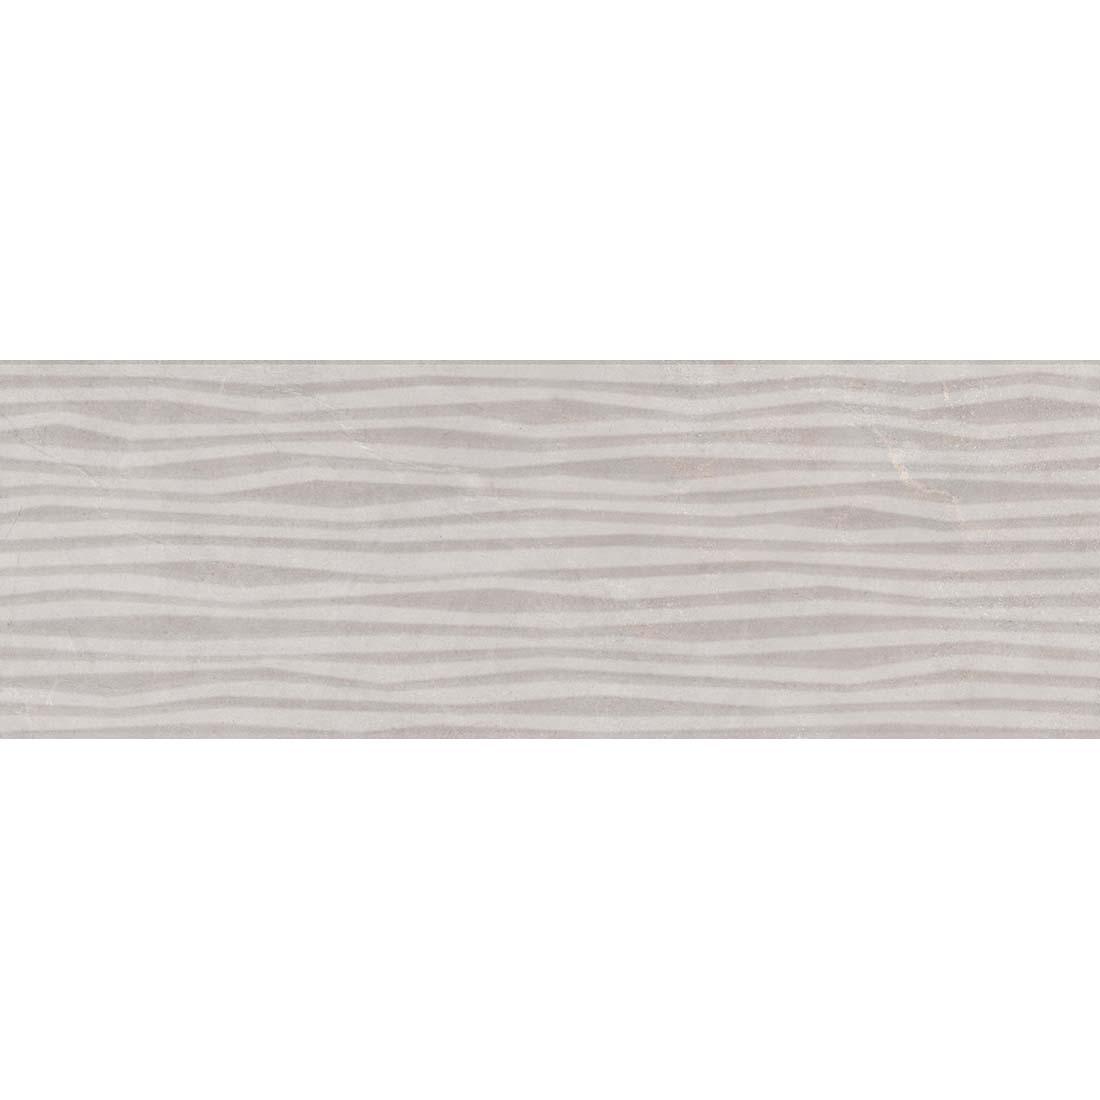 Mist Stripe Decor 20x60 Grey 1